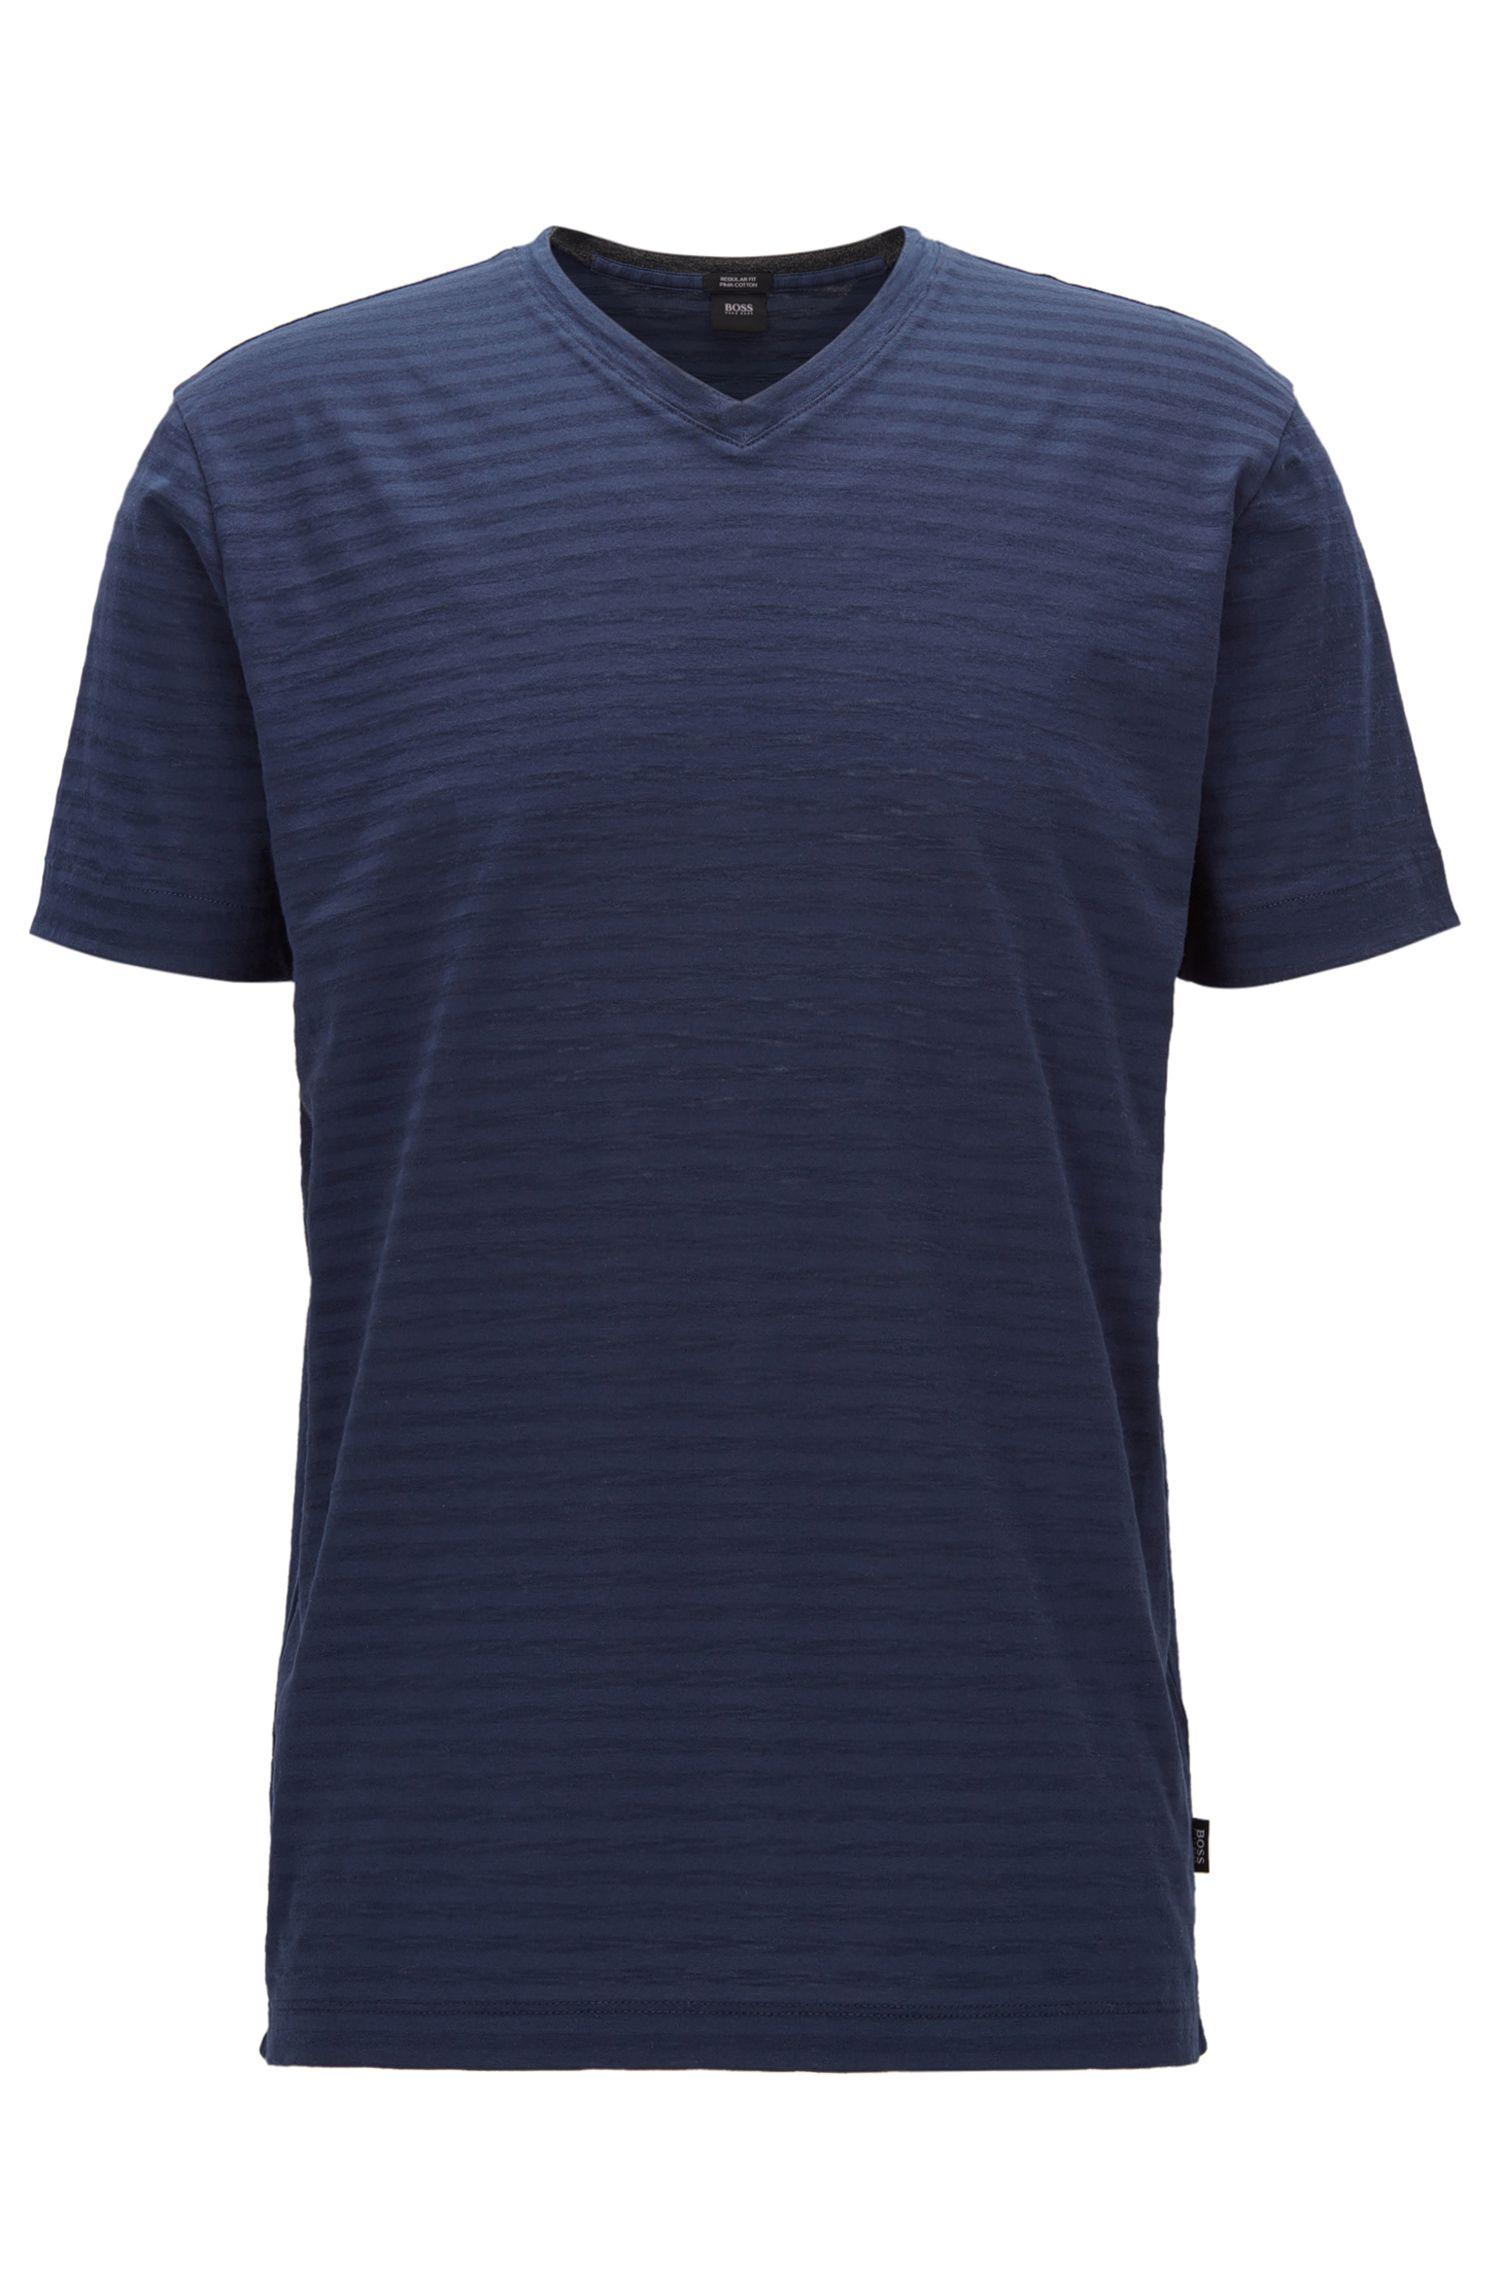 Striped Pima Cotton T-Shirt | Tilson